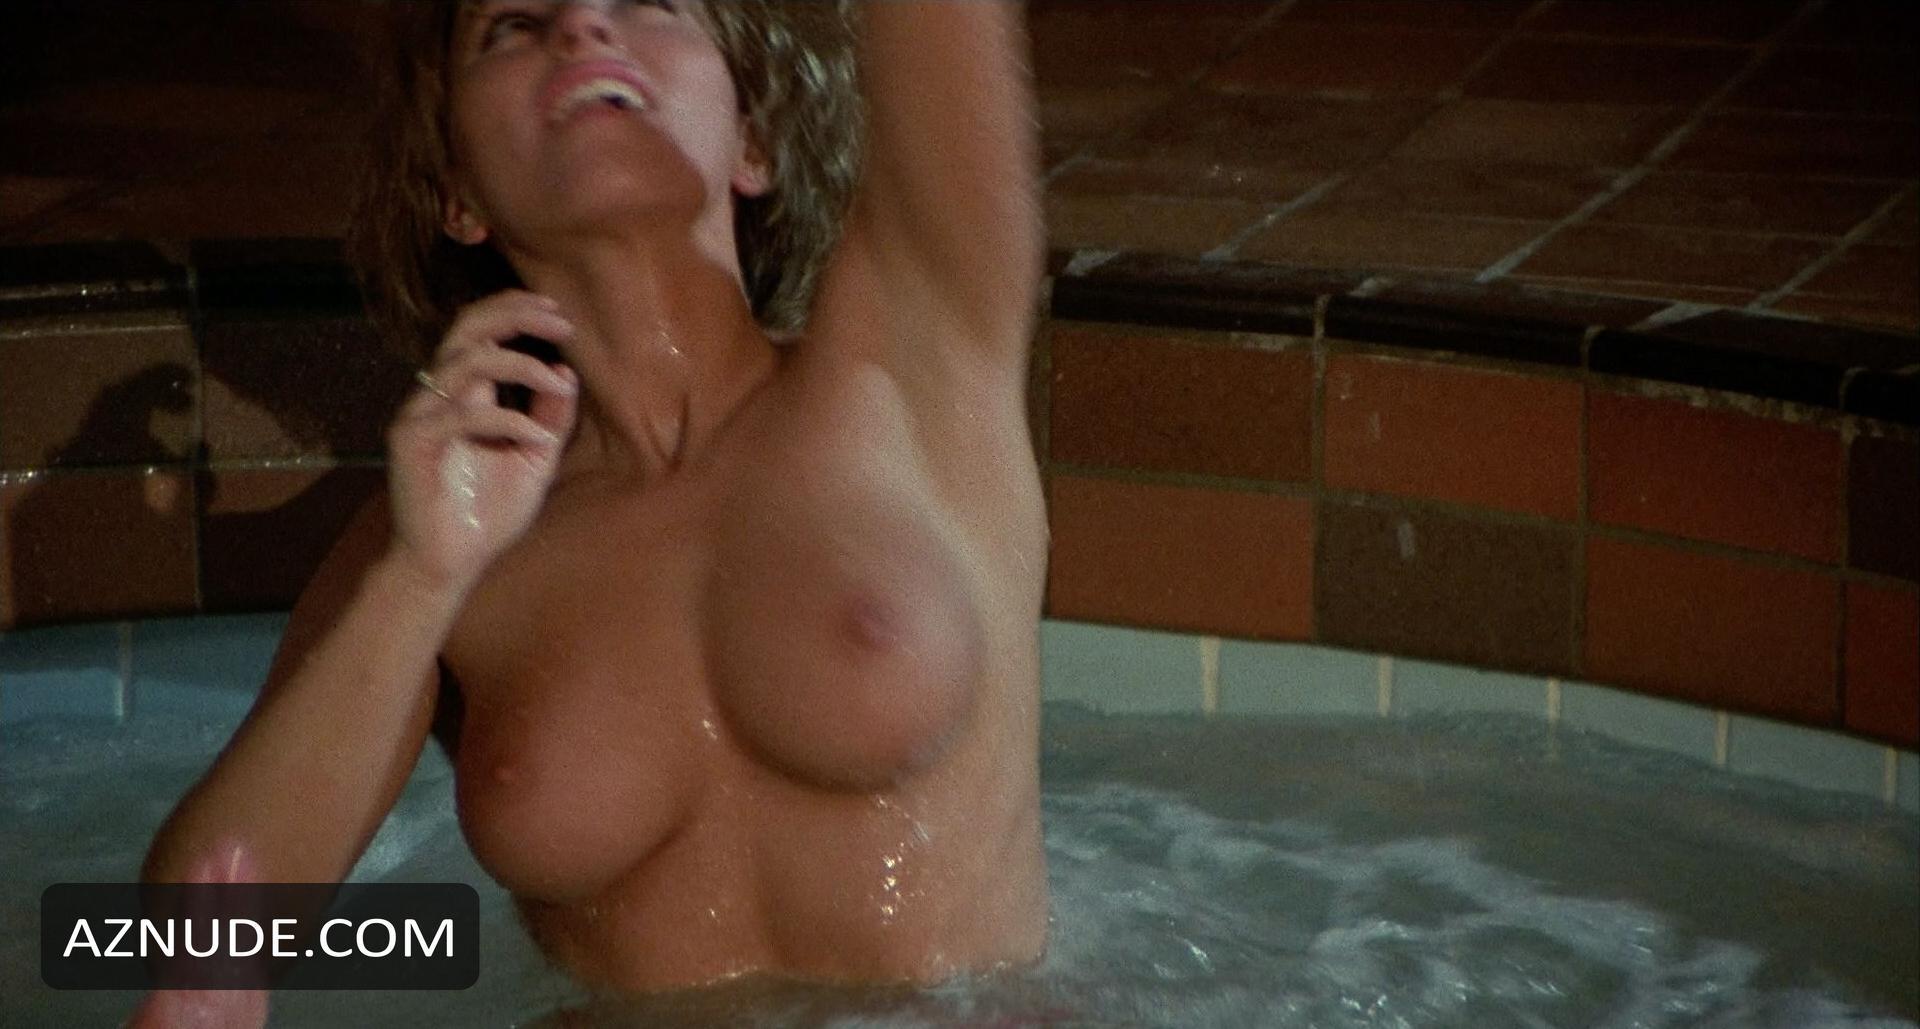 Ava Fabian Porno ava fabian hot girl hd wallpaper   free download nude photo